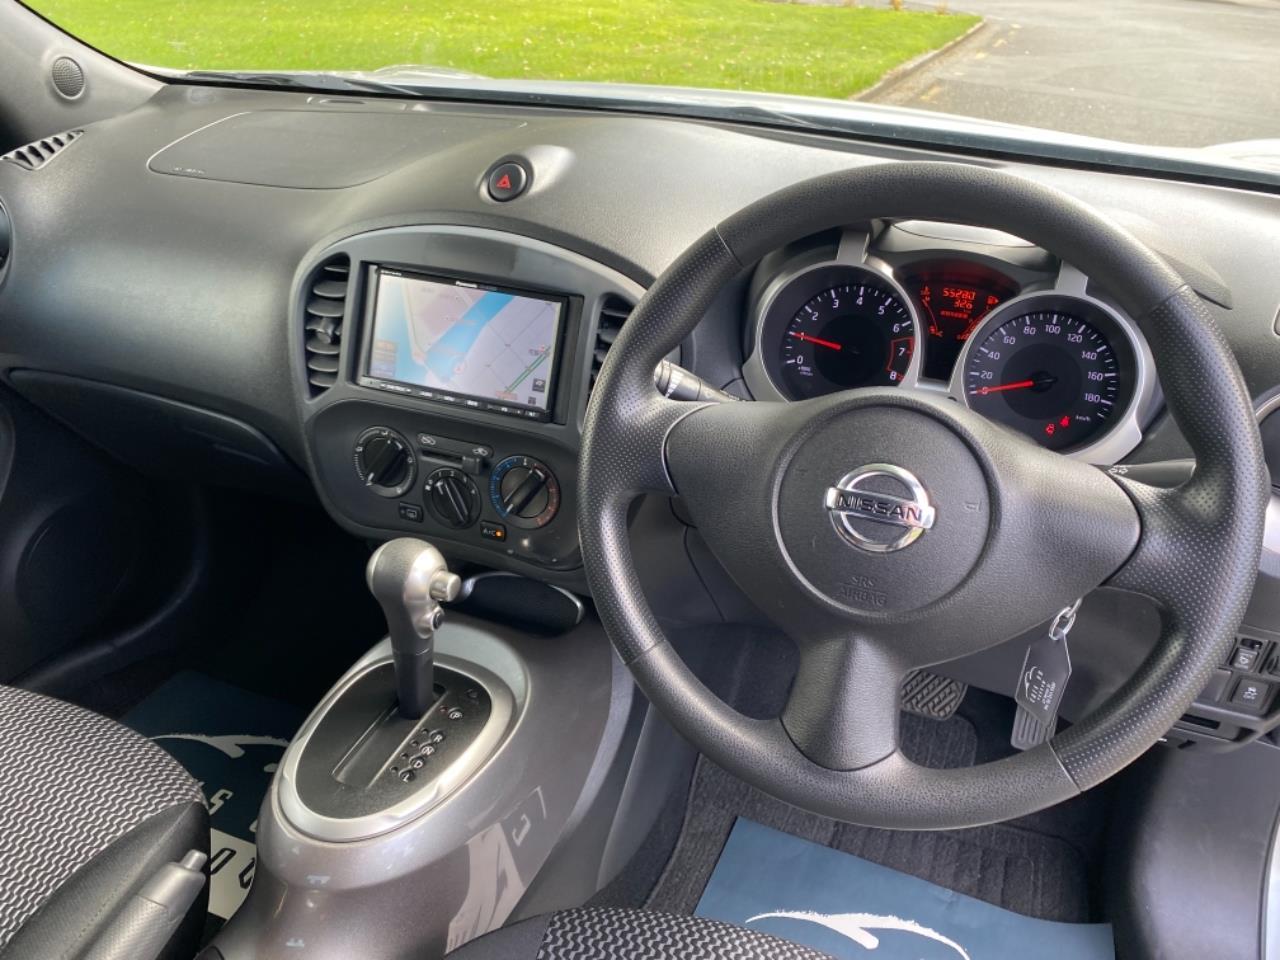 image-5, 2015 Nissan Juke 15 RS at Invercargill